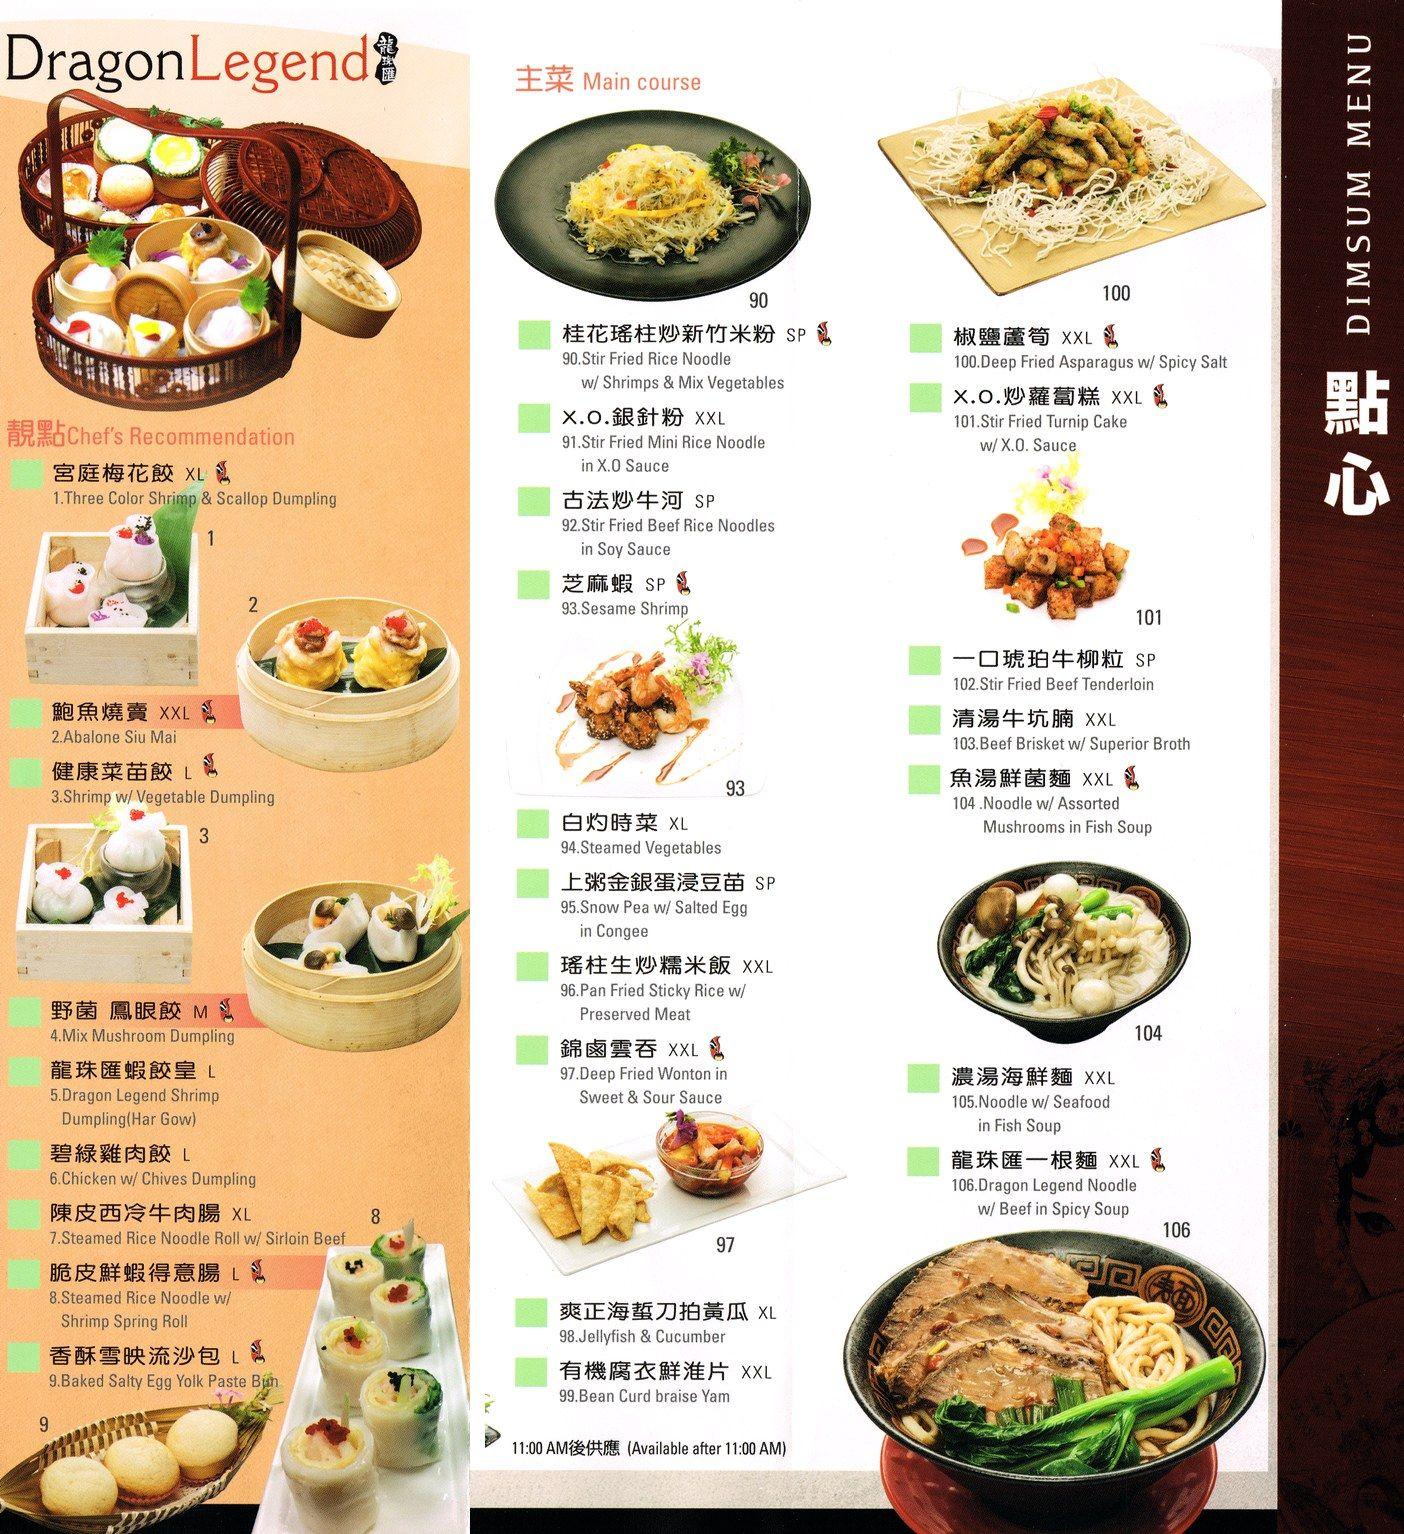 Dragon Legend Menu 龍珠匯菜单 25 Lanark Rd Markham 9059401811 Main Course Menu Menu Restaurant Take Out Menu